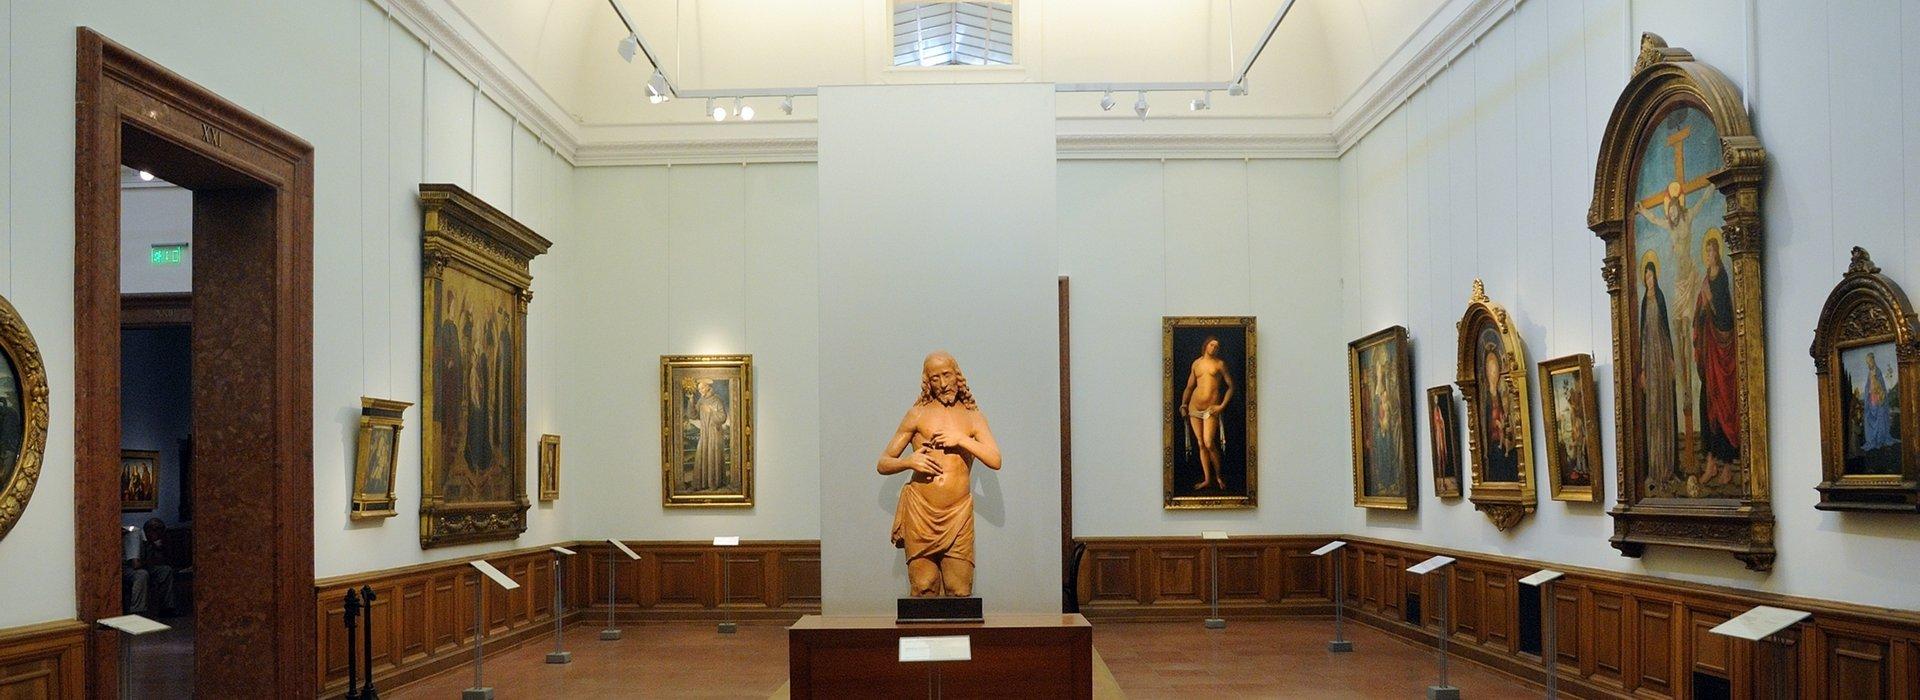 Exhibiton halls & galleries